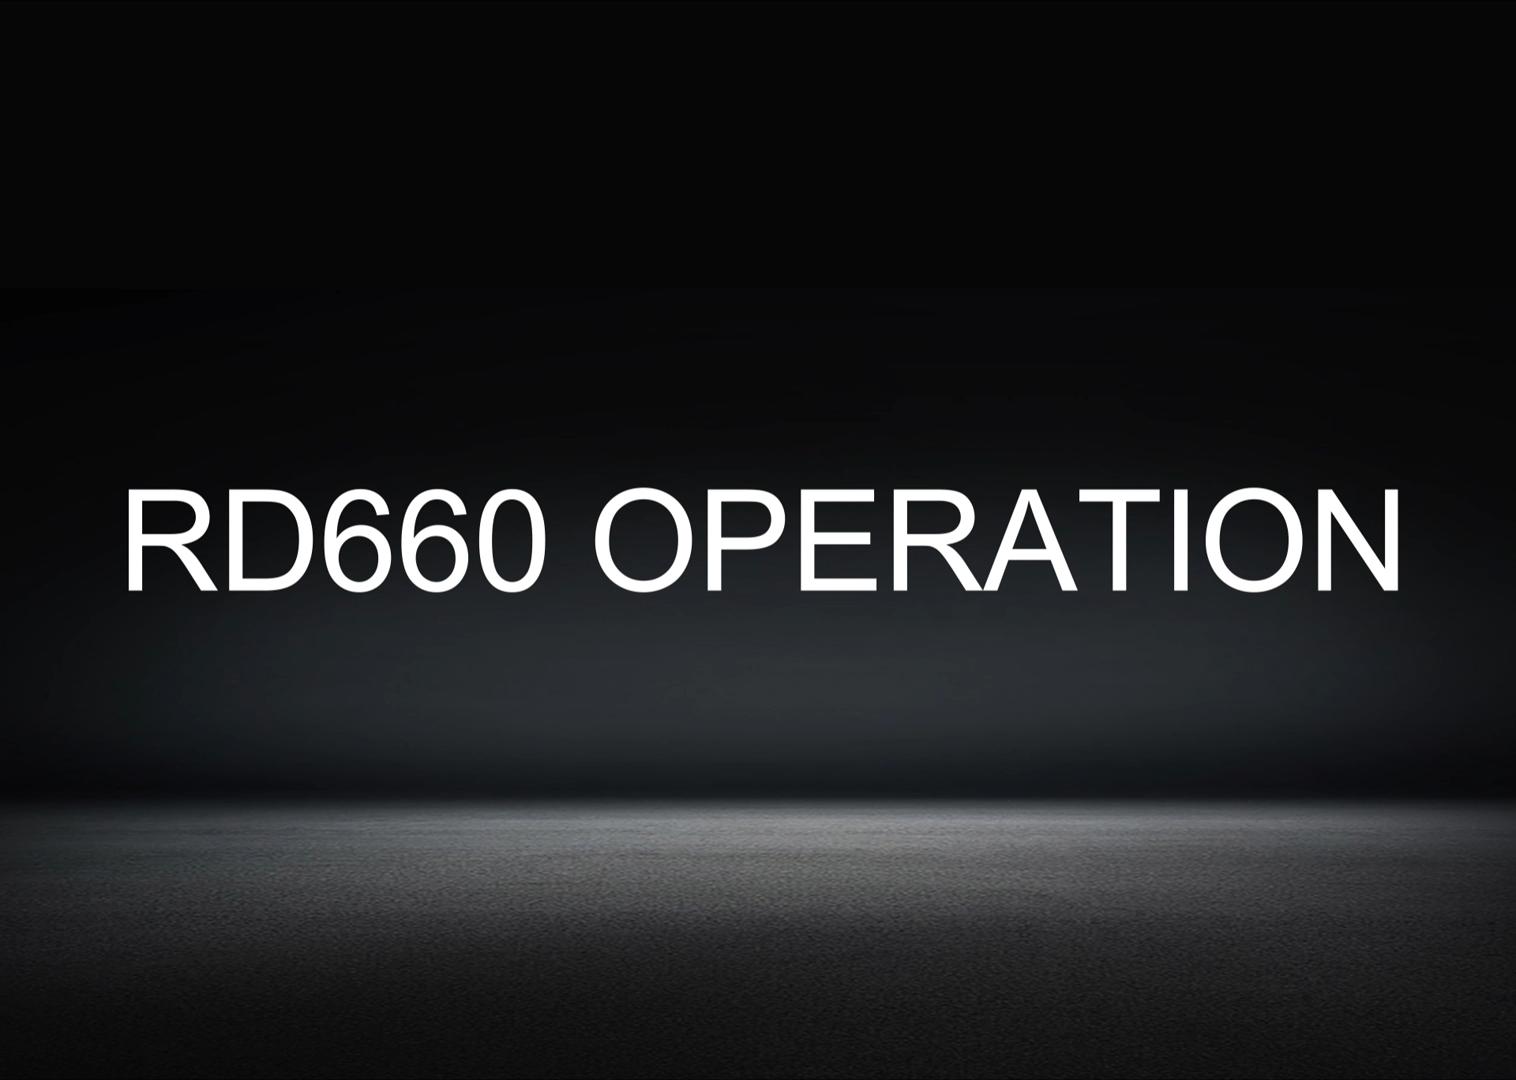 RD660 Automatische Magazijn Rit Op Kenia Vloer Scrubber